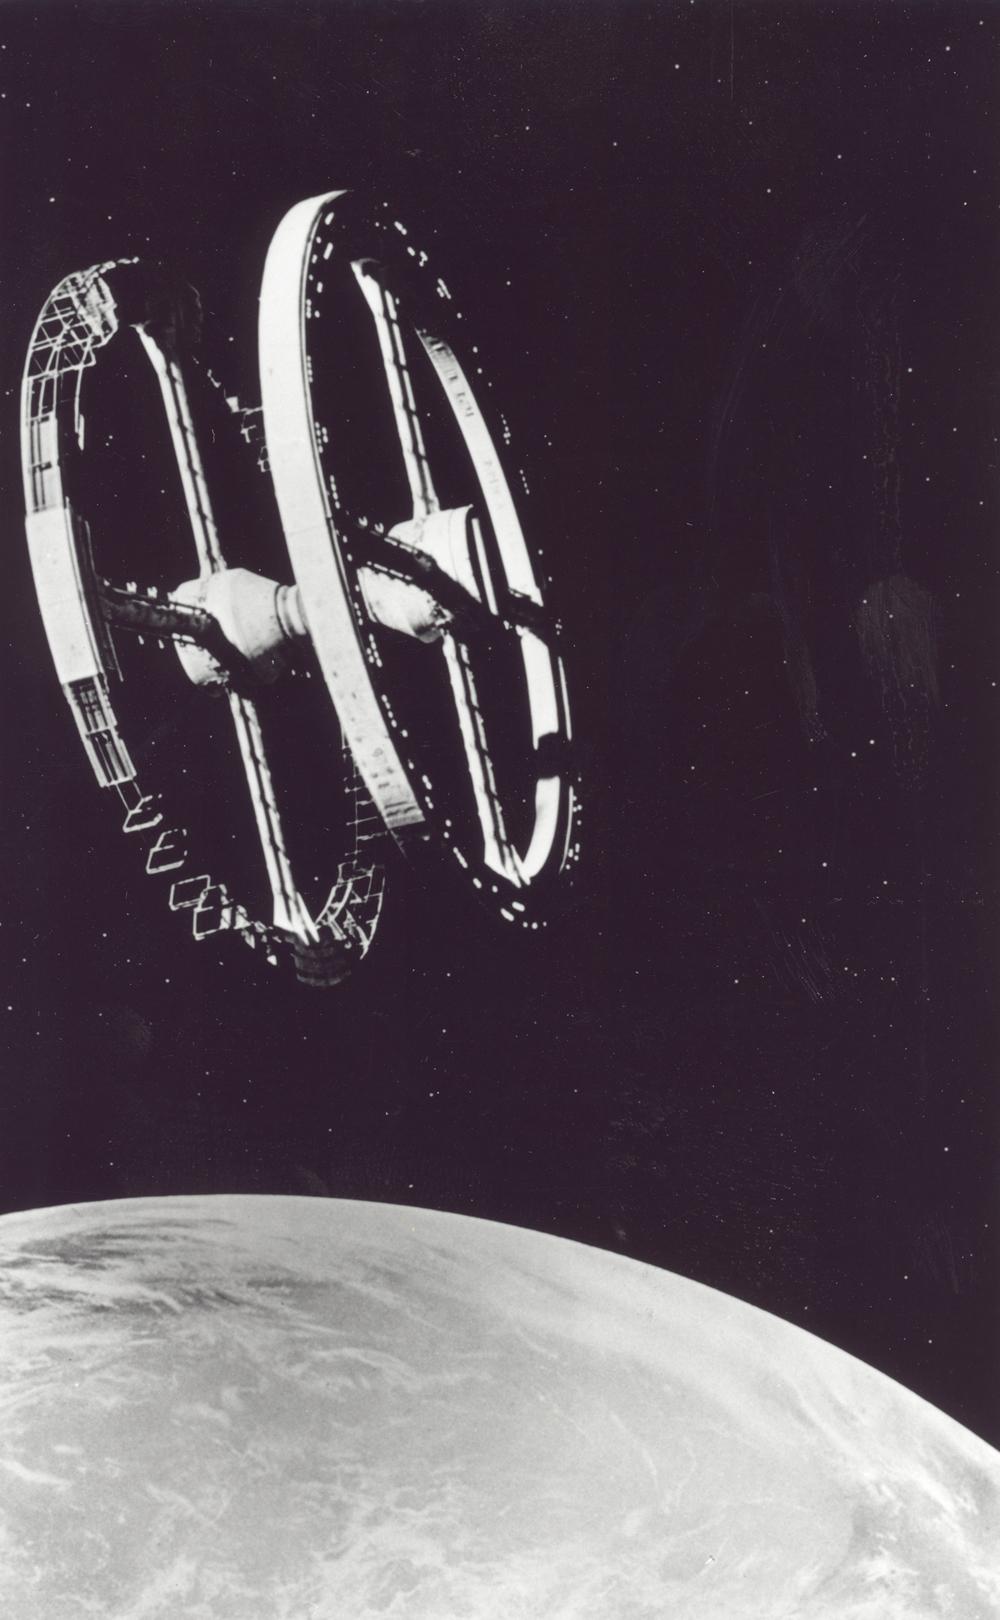 Space Station V (